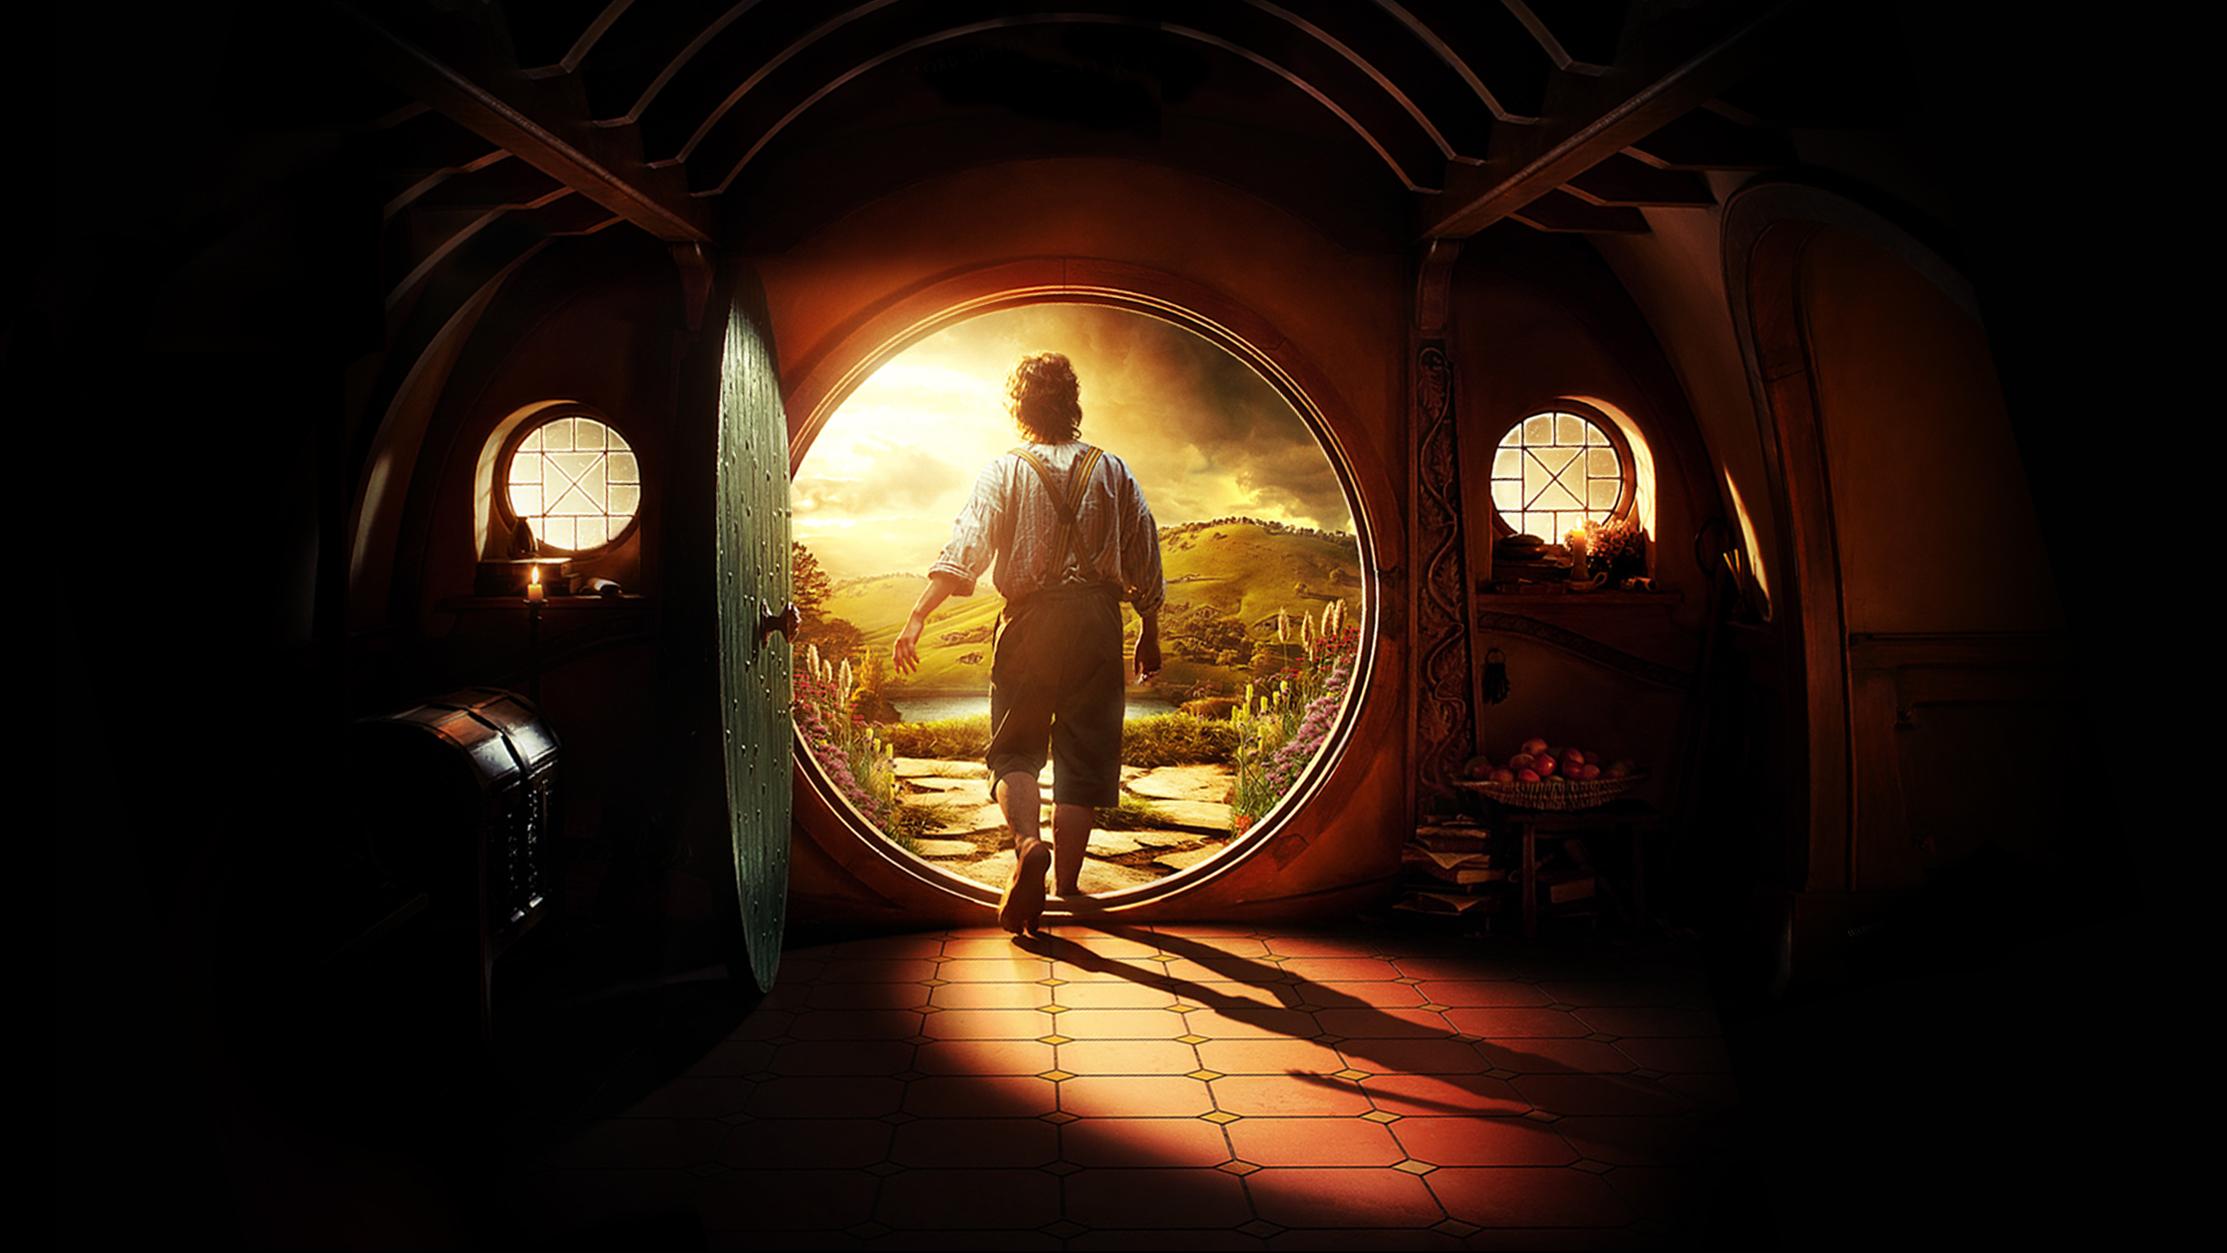 The Hobbit   Bilbo Baggins Wallpaper   The Hobbit Photo 2227x1253